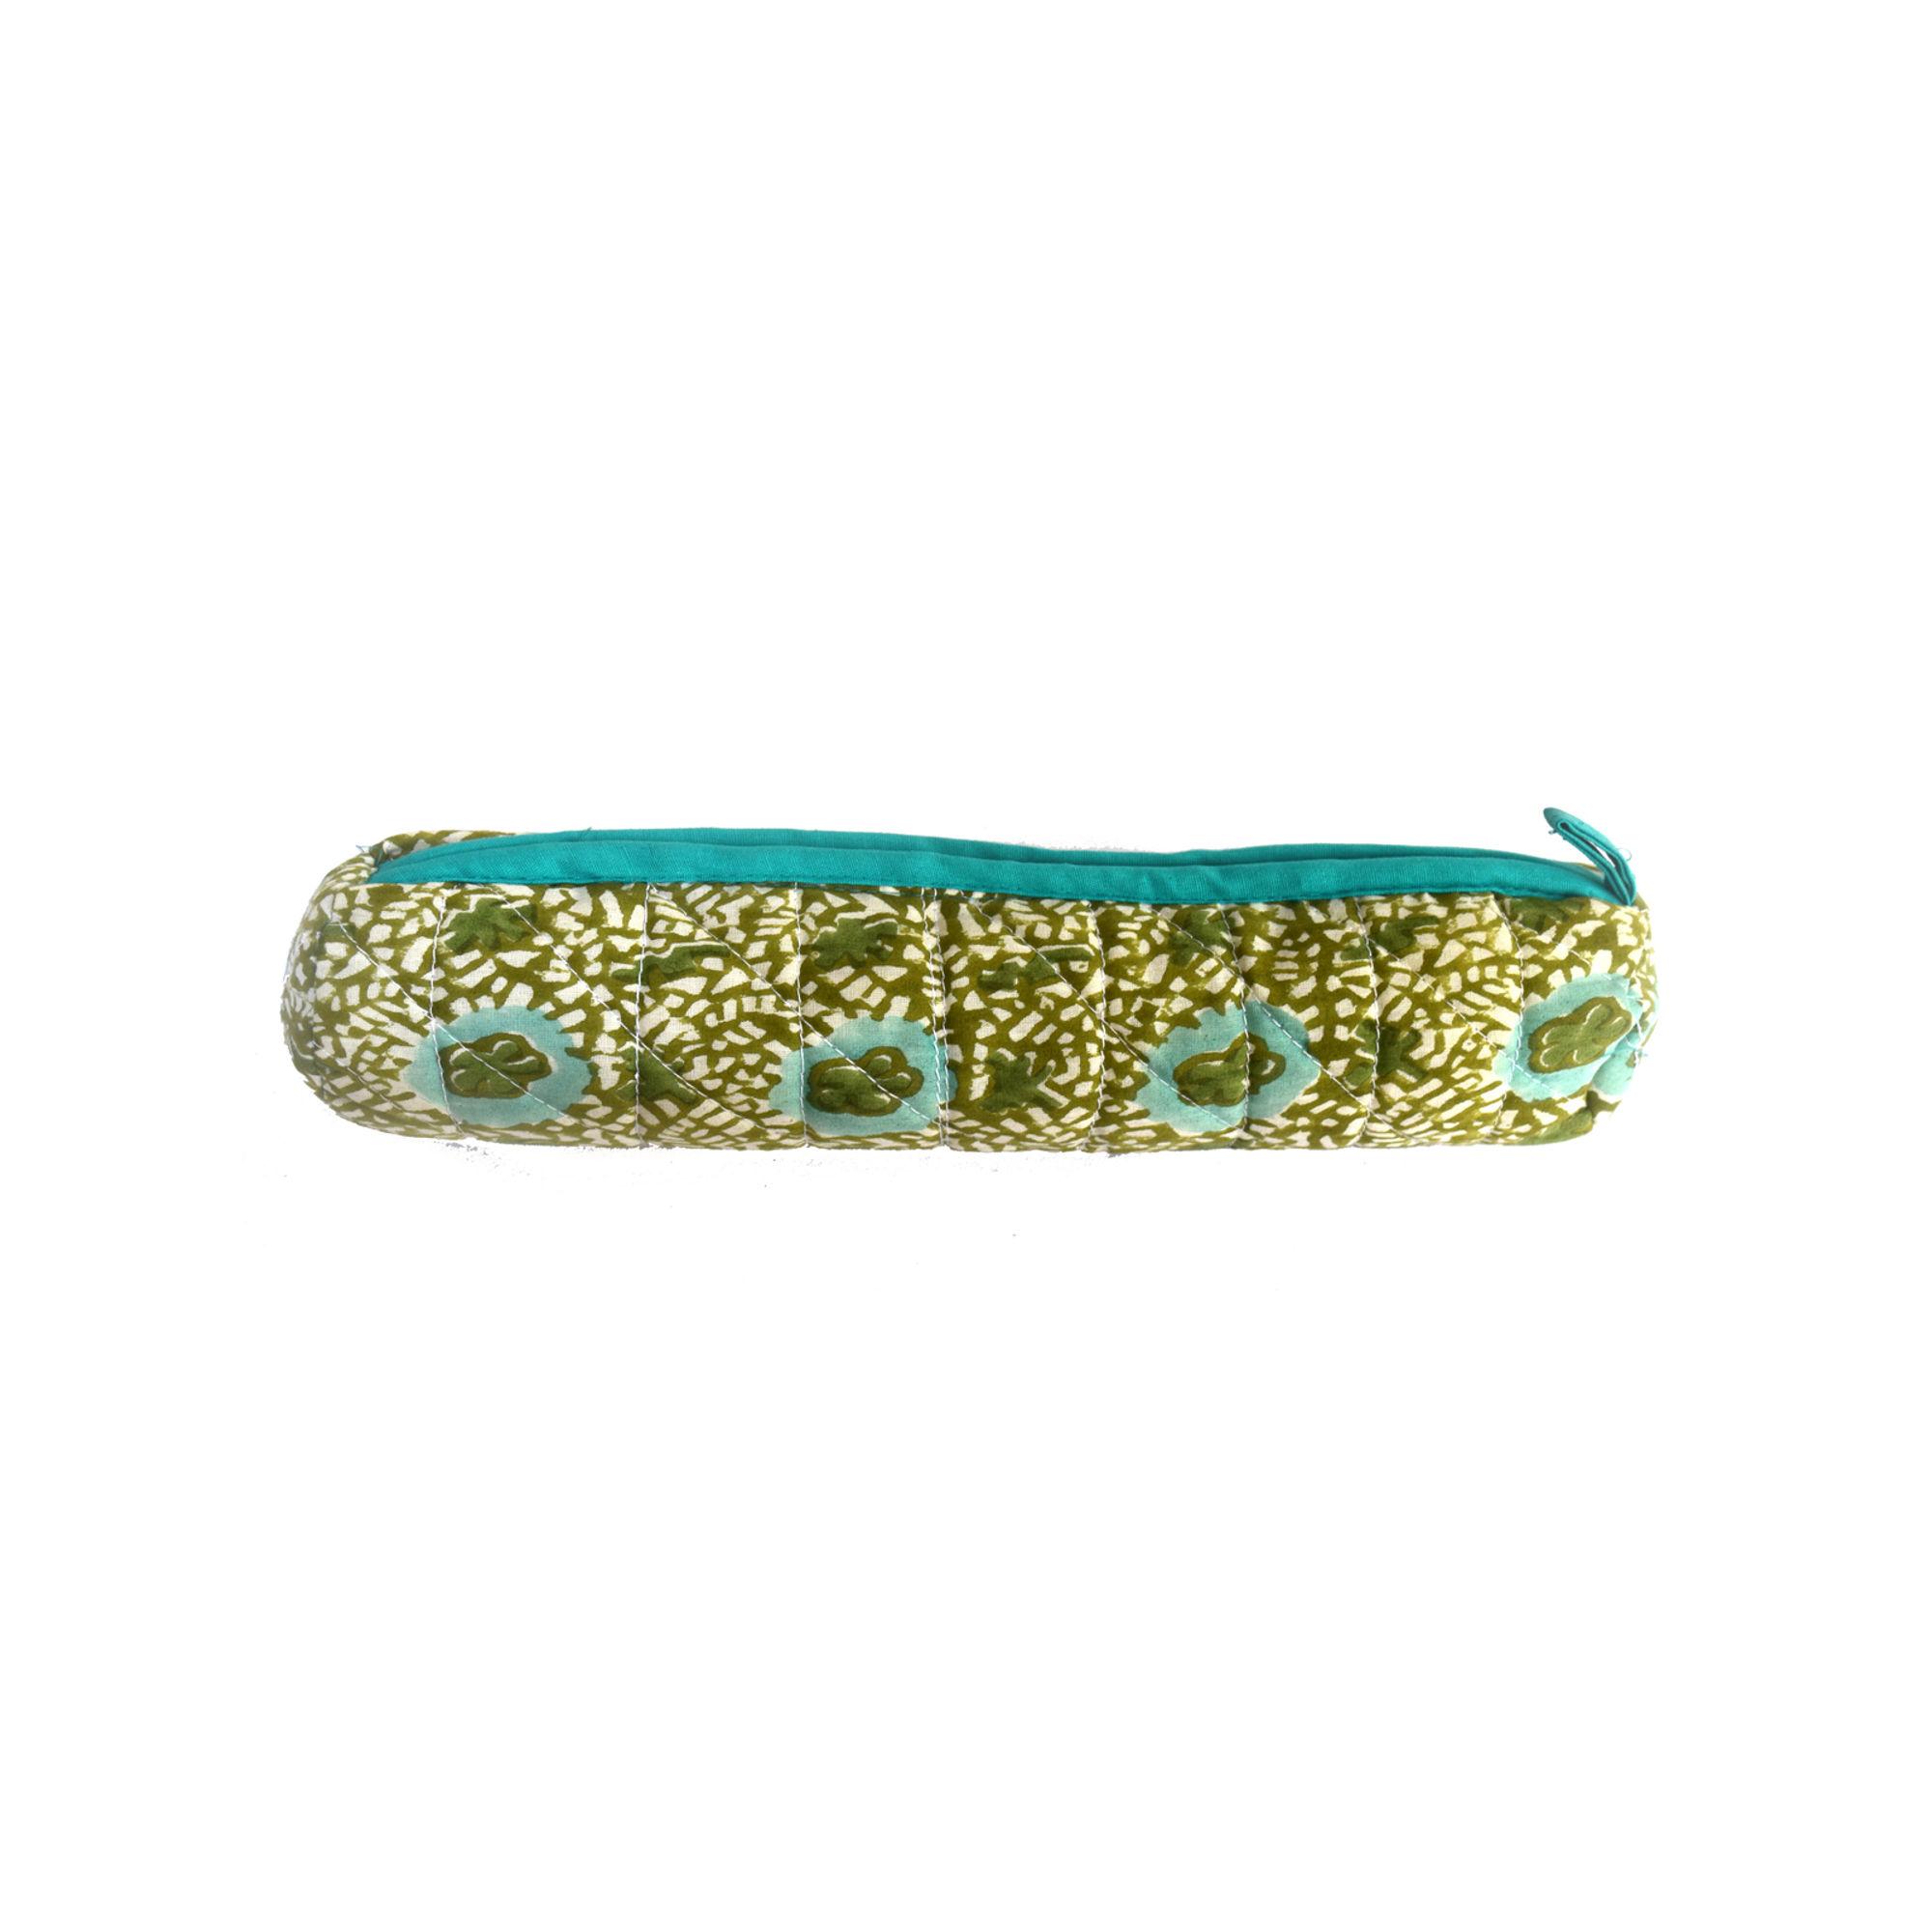 Beautiful Pencil Pouch green